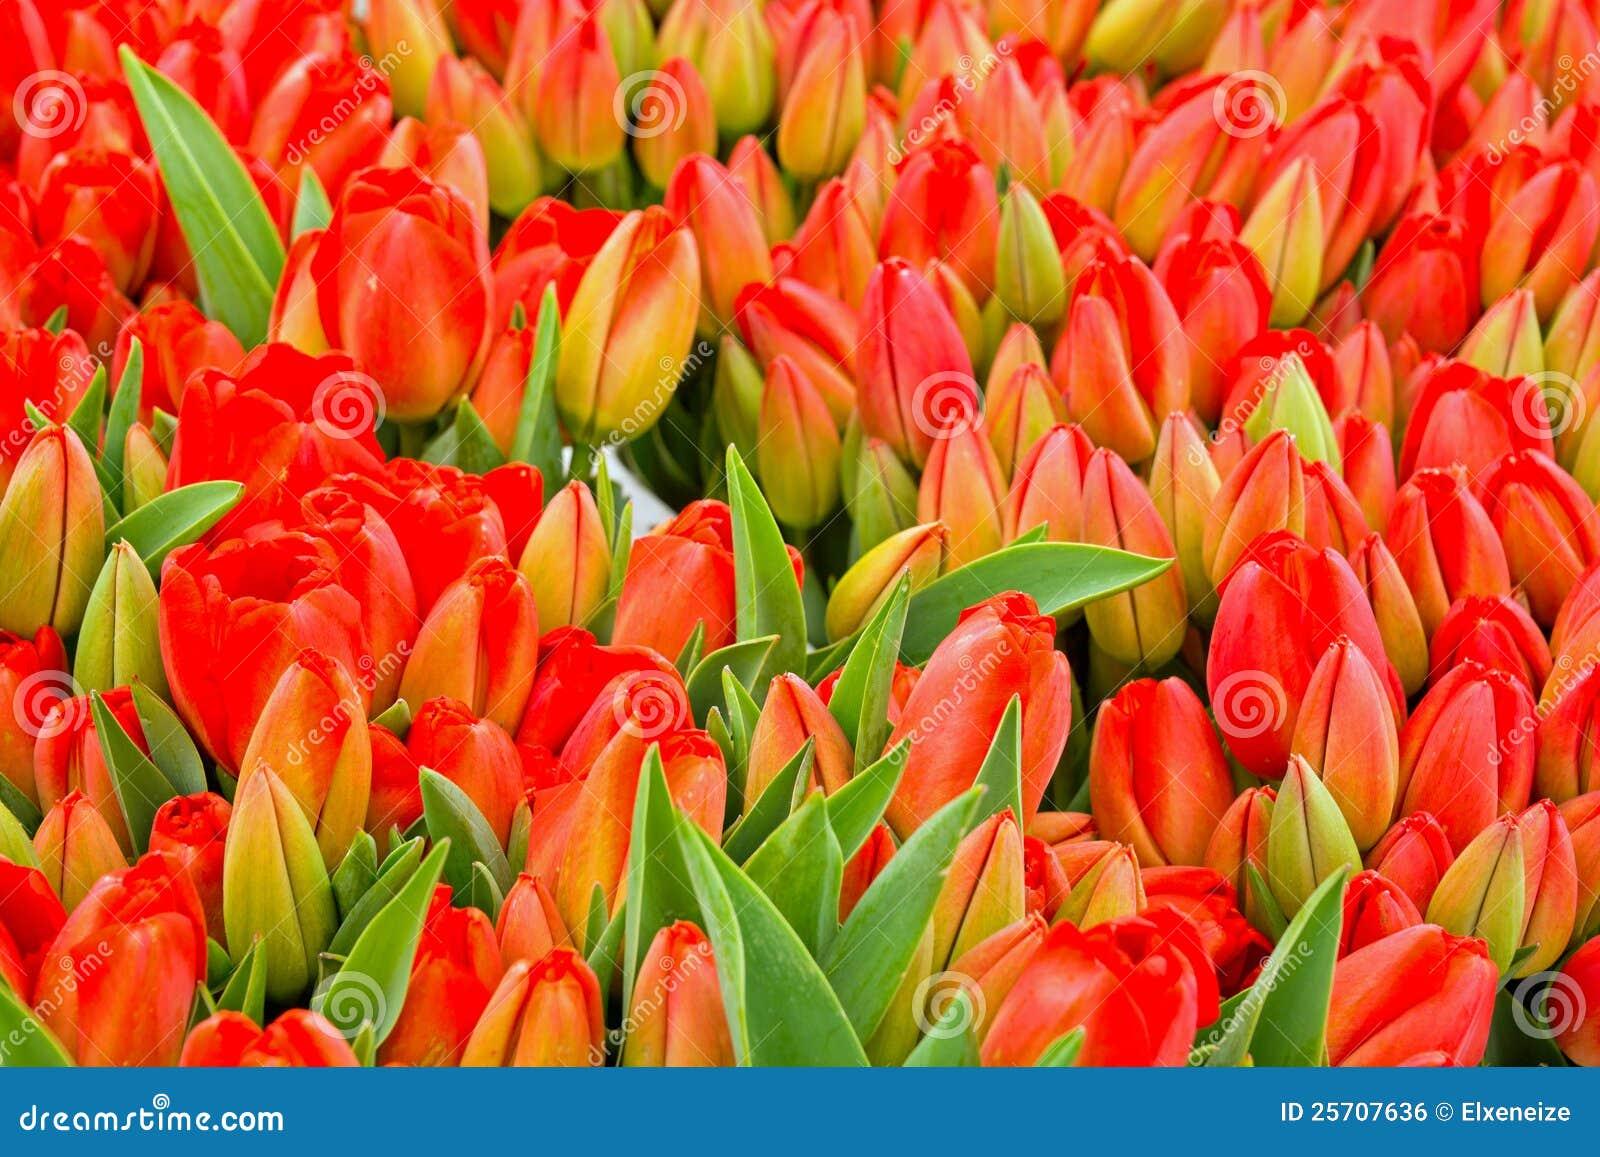 Beautiful tulip flowers stock photo image of flower 25707636 beautiful tulip flowers izmirmasajfo